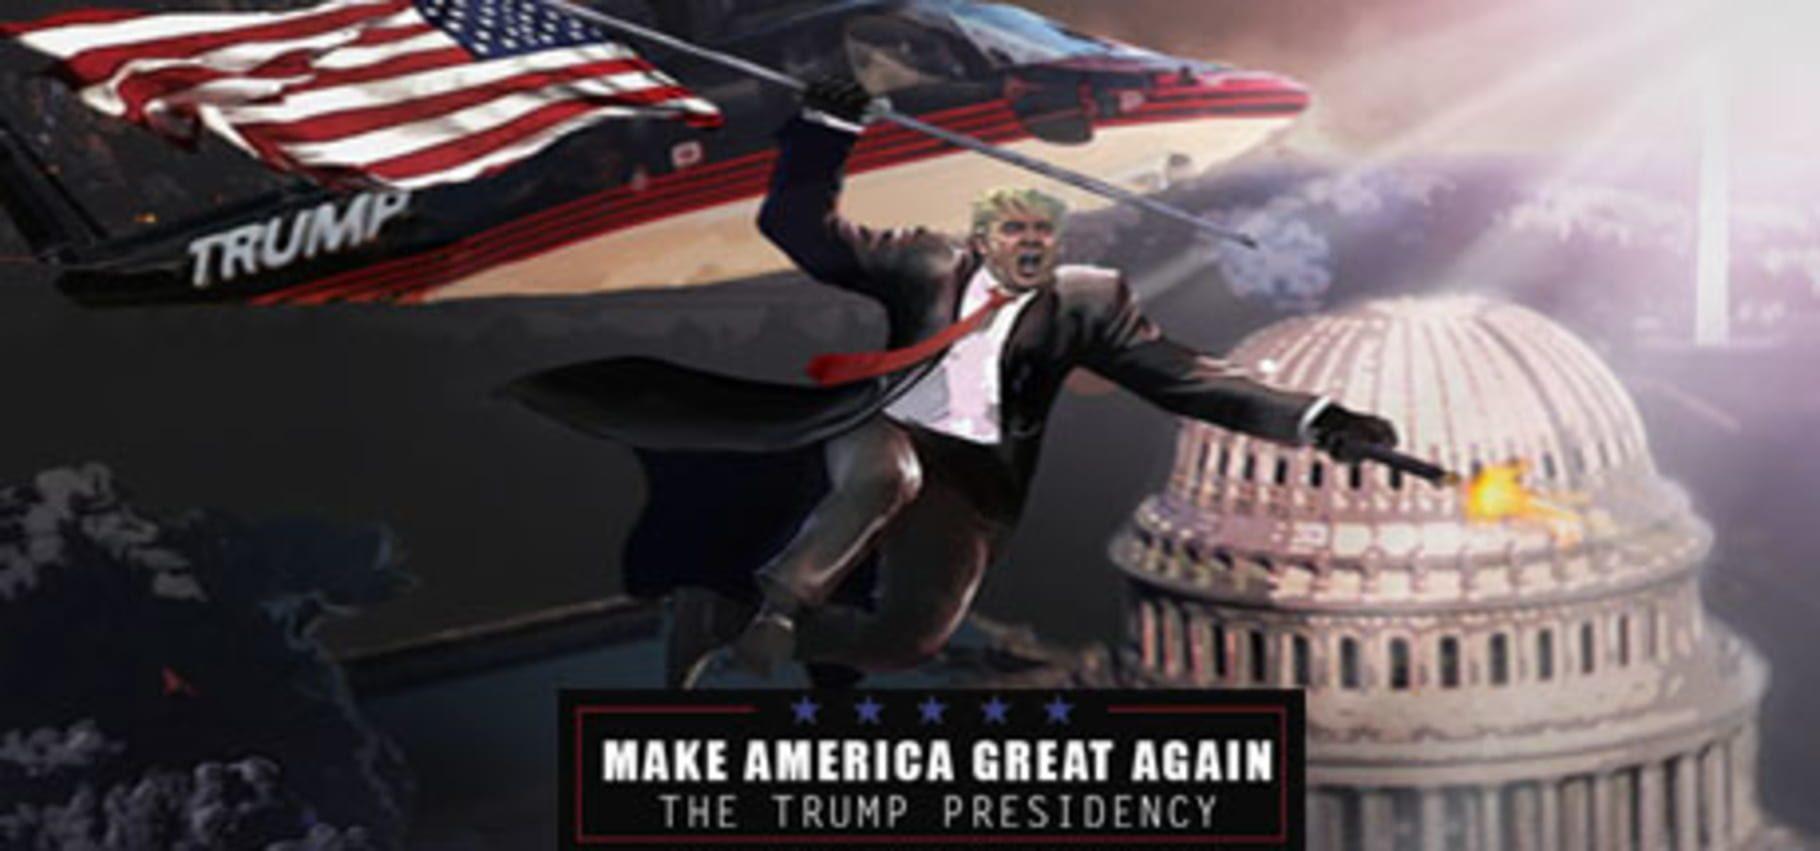 buy Make America Great Again: The Trump Presidency cd key for all platform